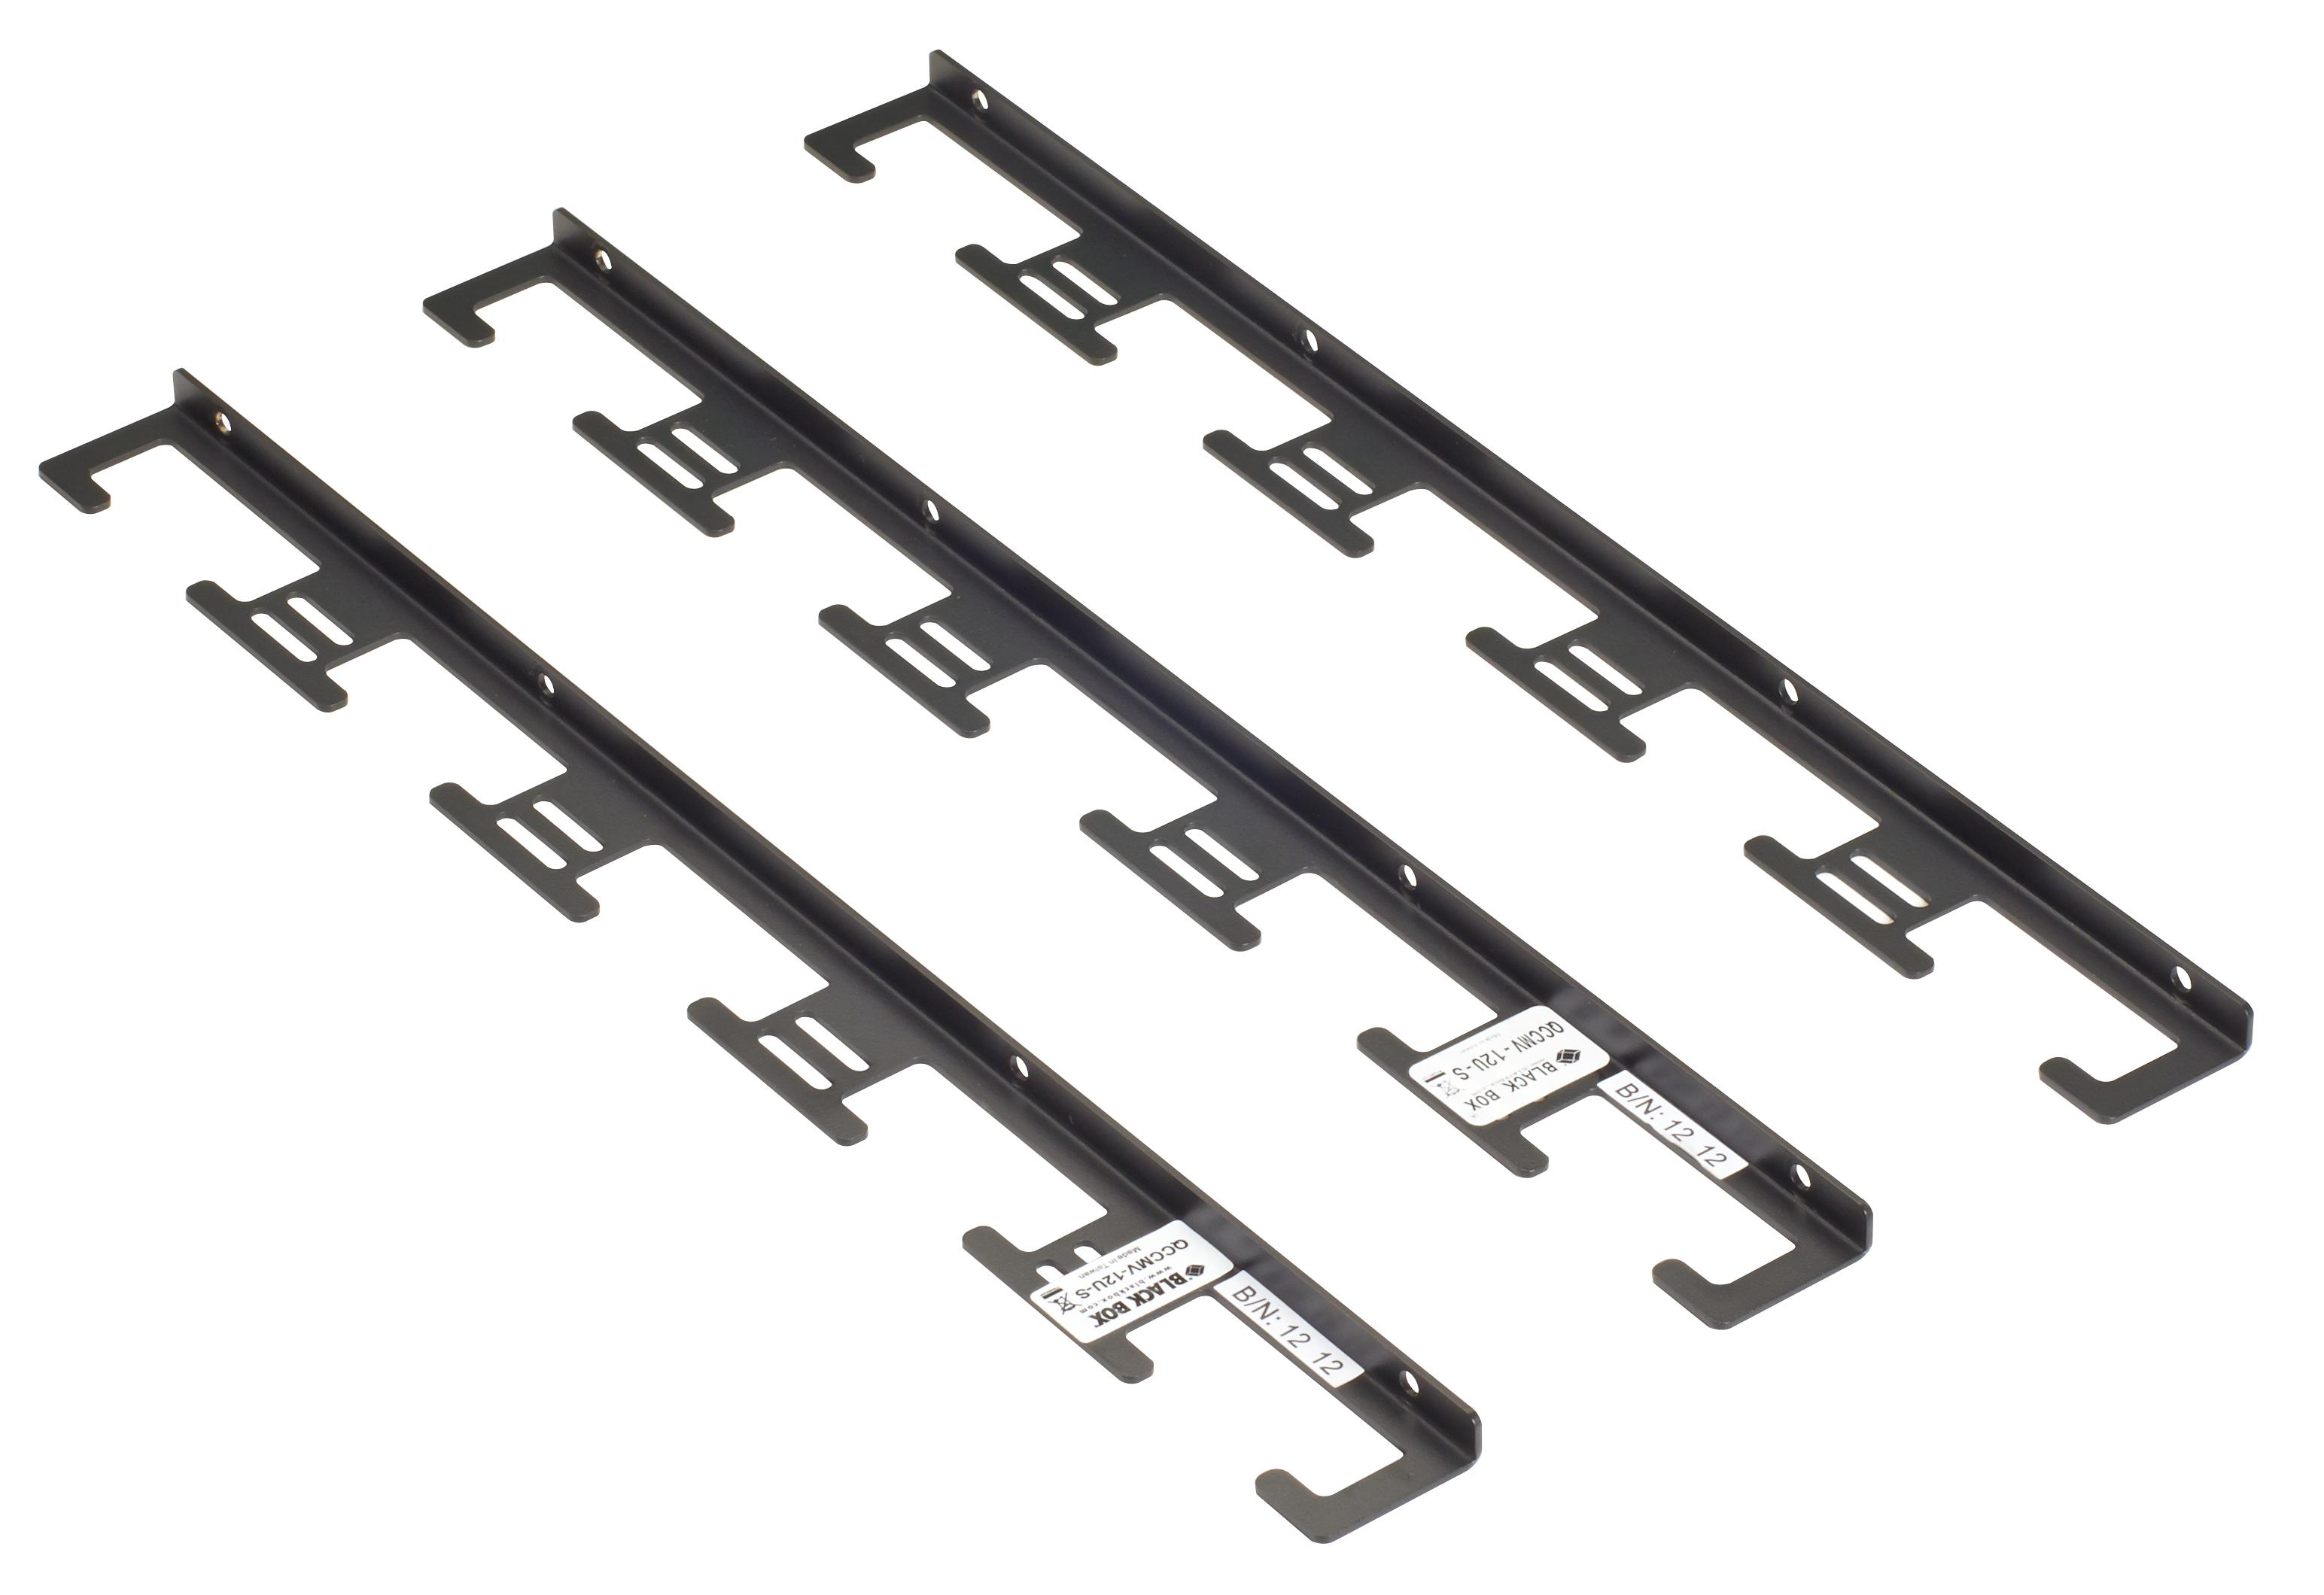 Black Box Cable Management Visio Stencils